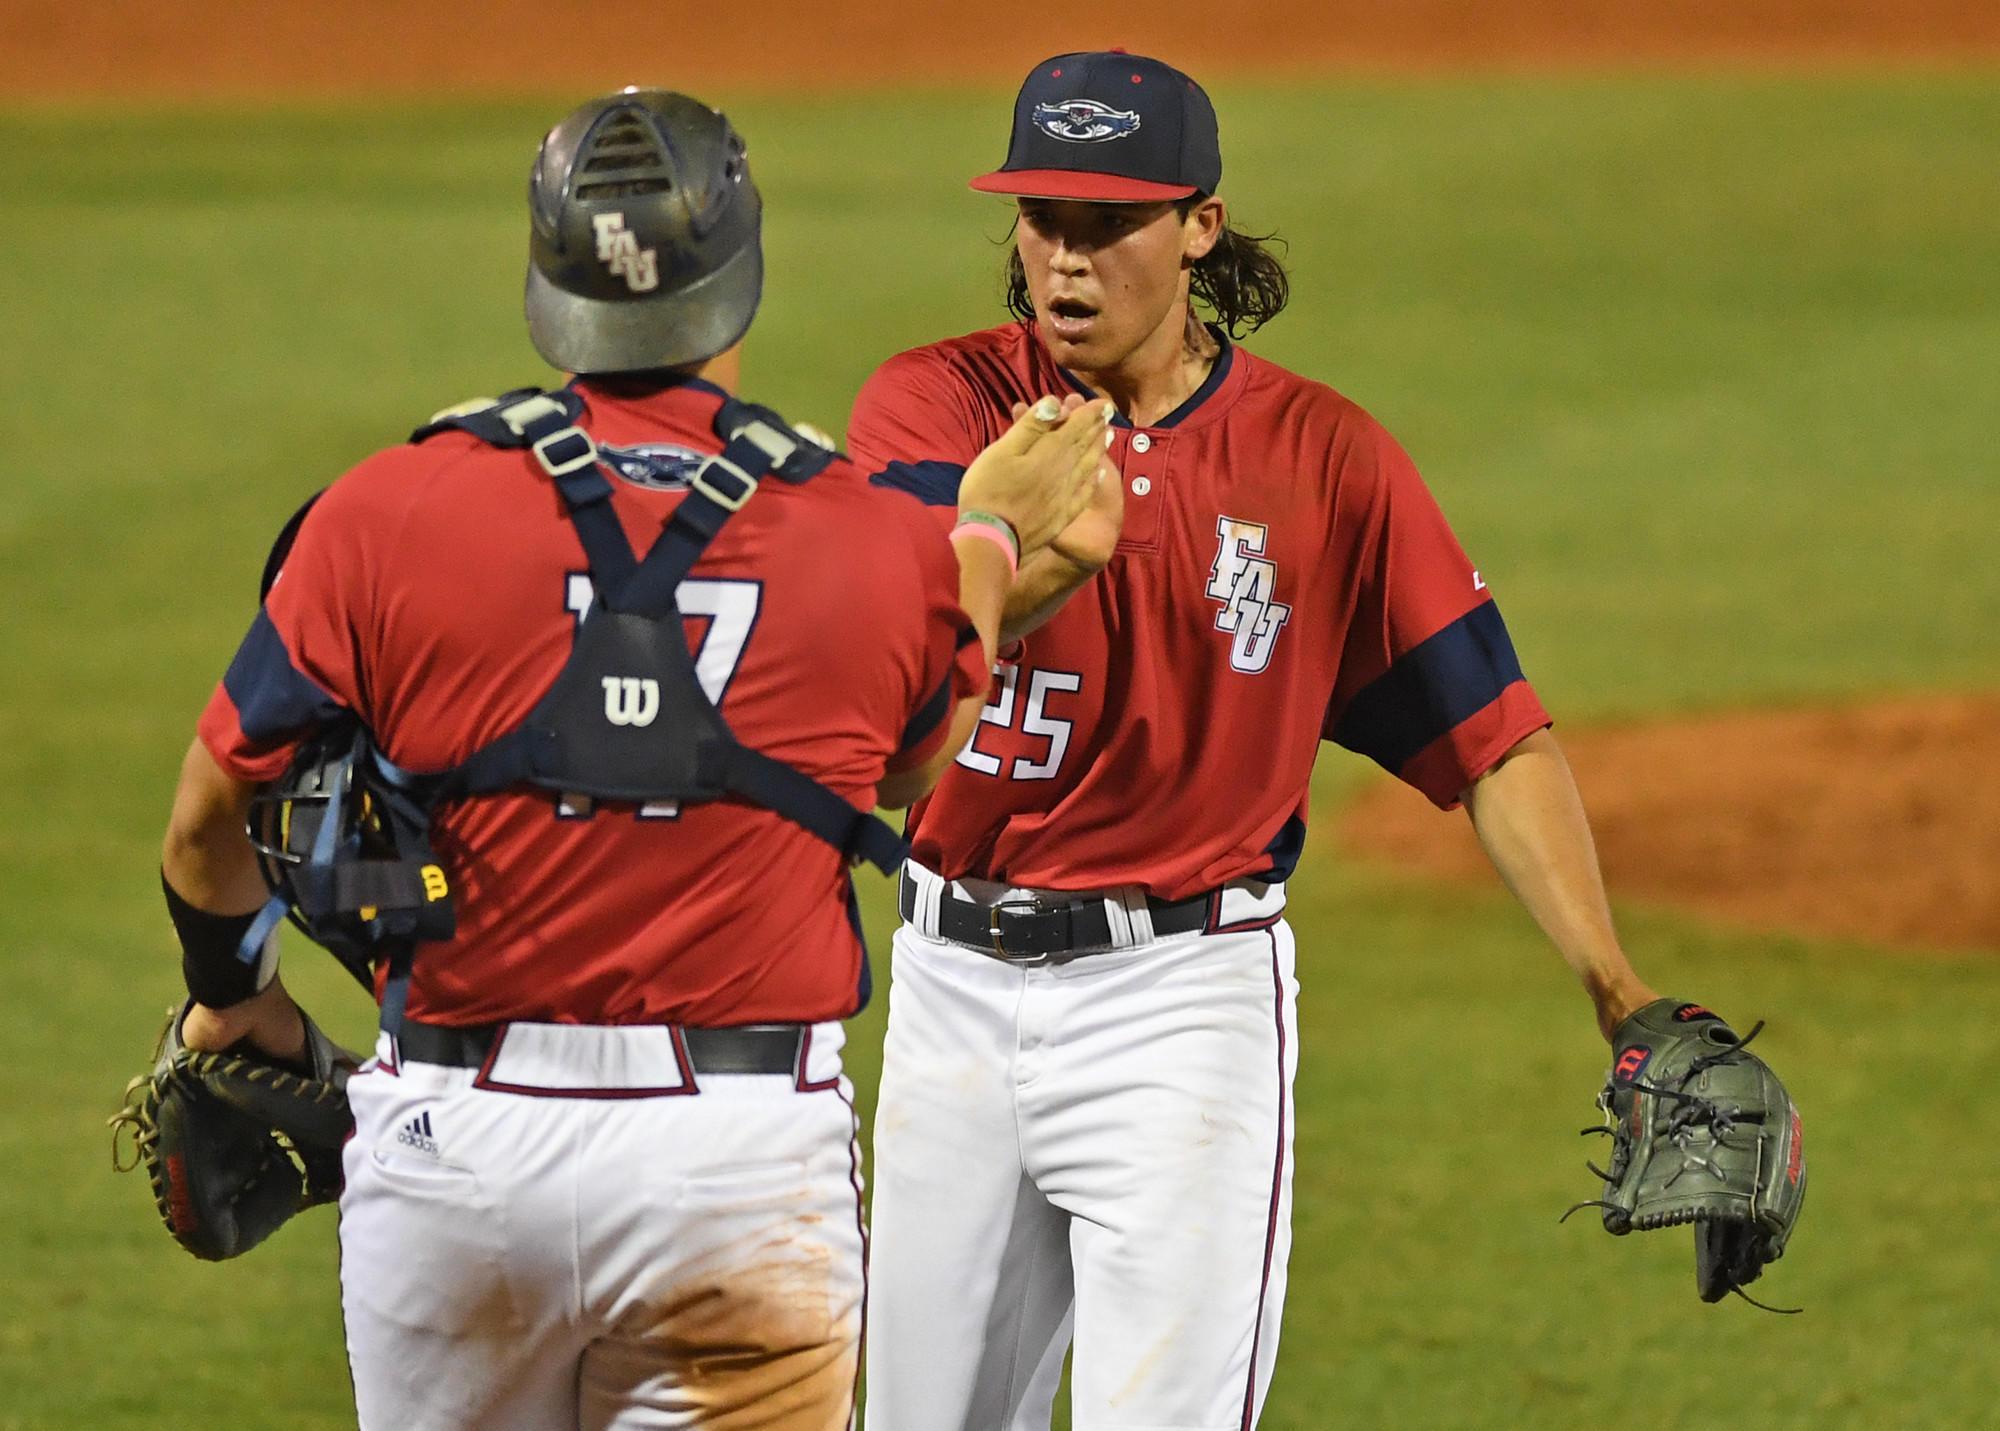 FAU baseball advances to today's Conference USA Tournament championship game